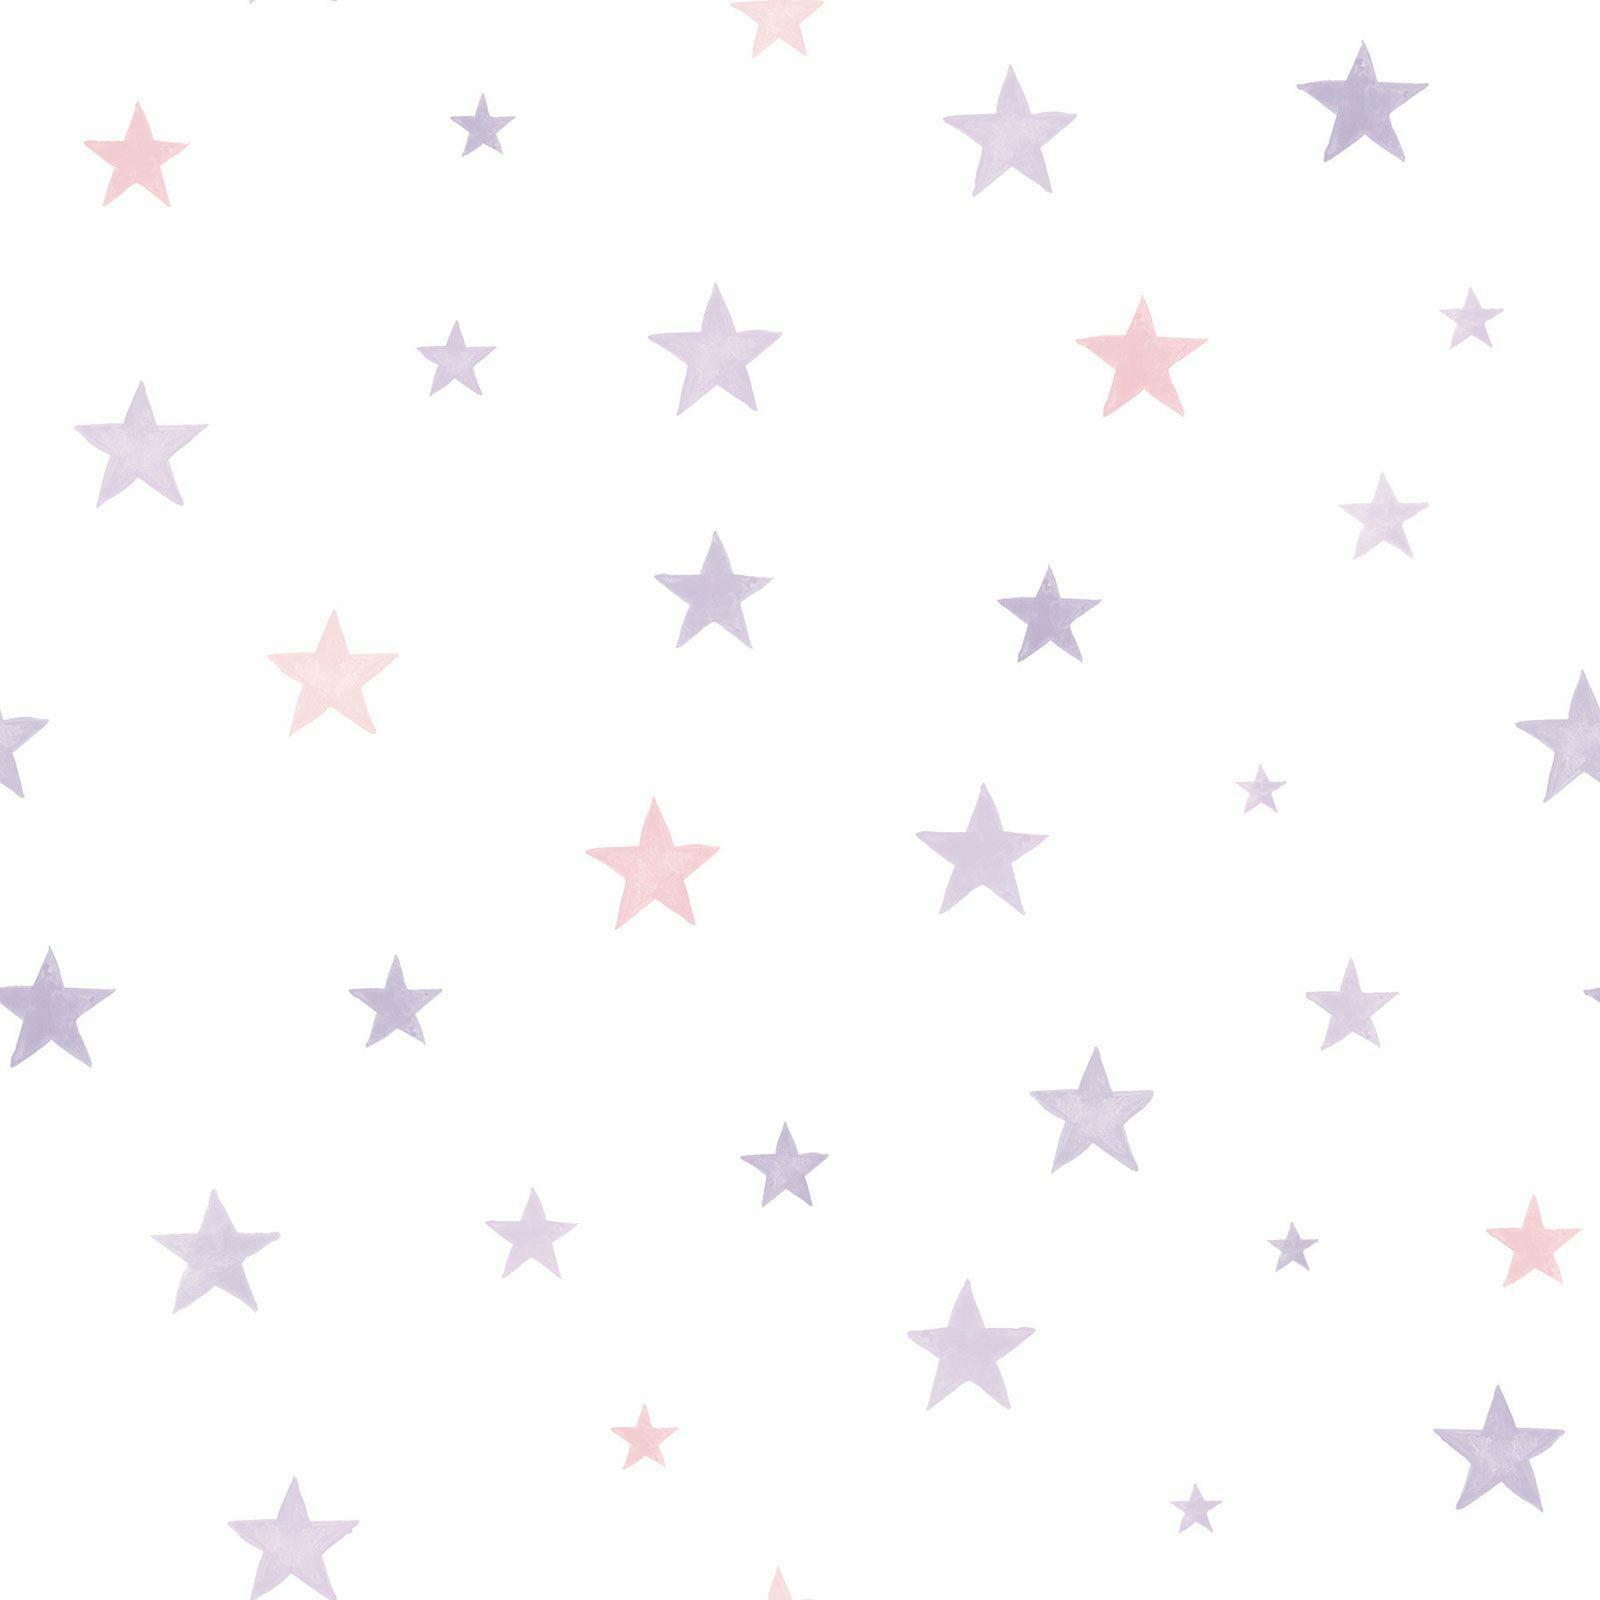 Grandeco Lo2702 Little Ones Eco Stars Wallpaper Pink Hypo